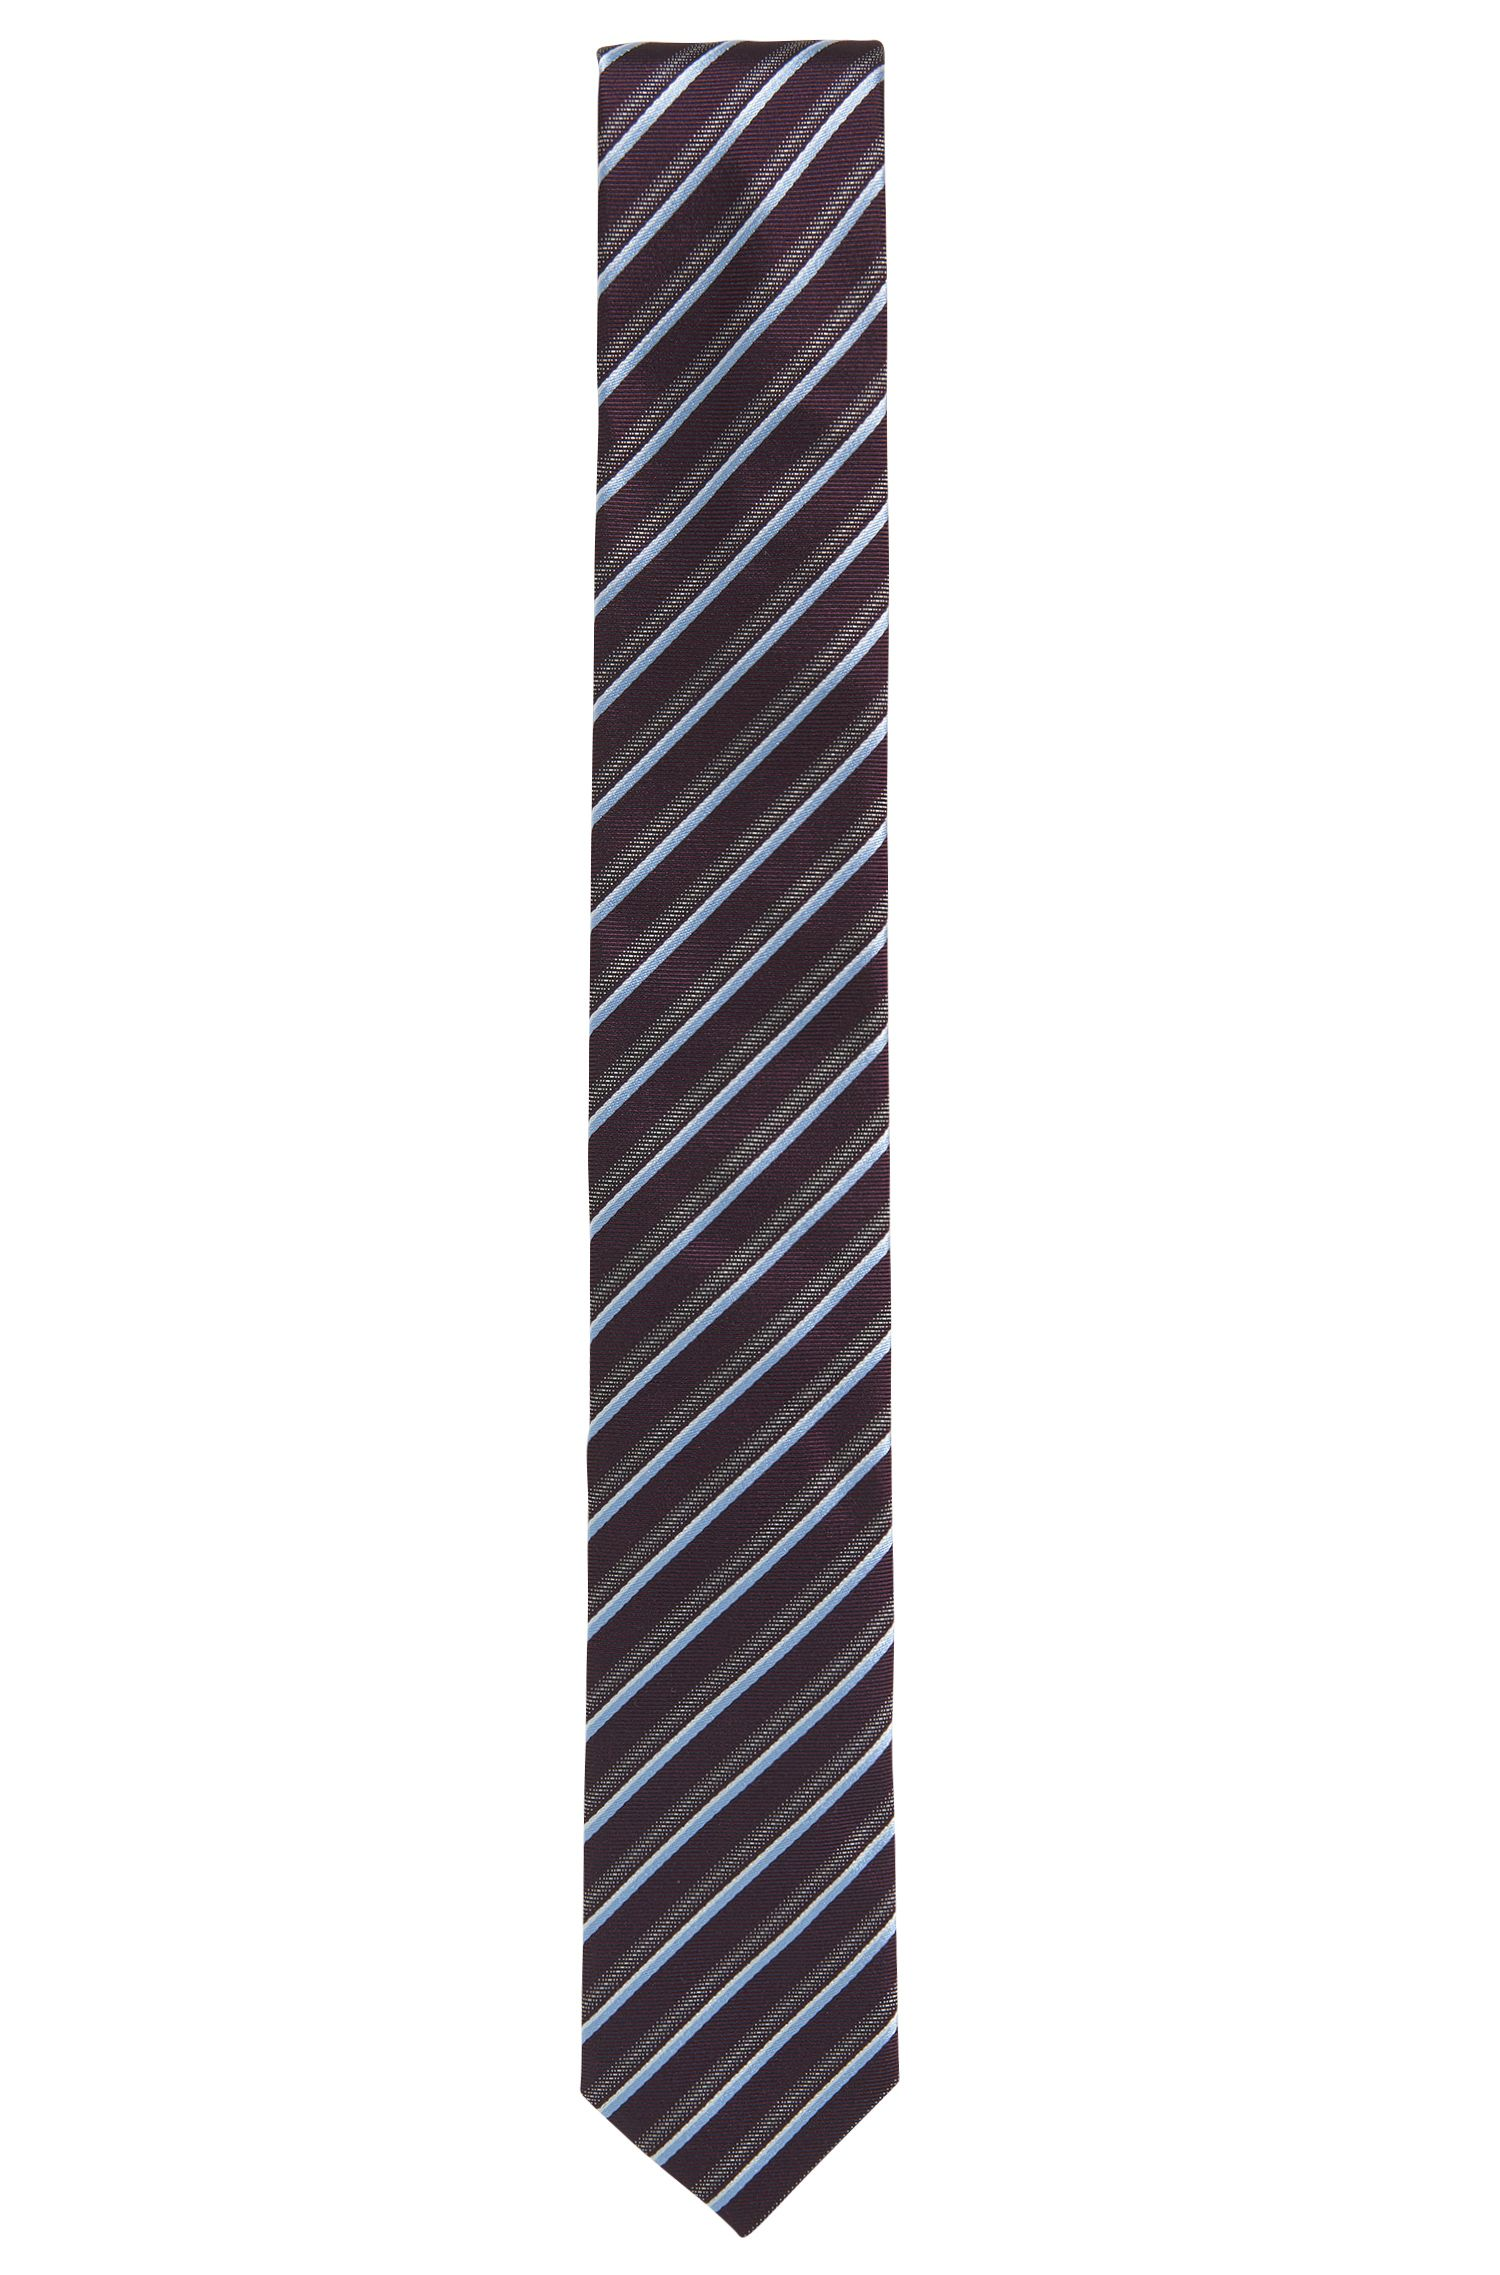 Cravatta in seta jacquard a righe